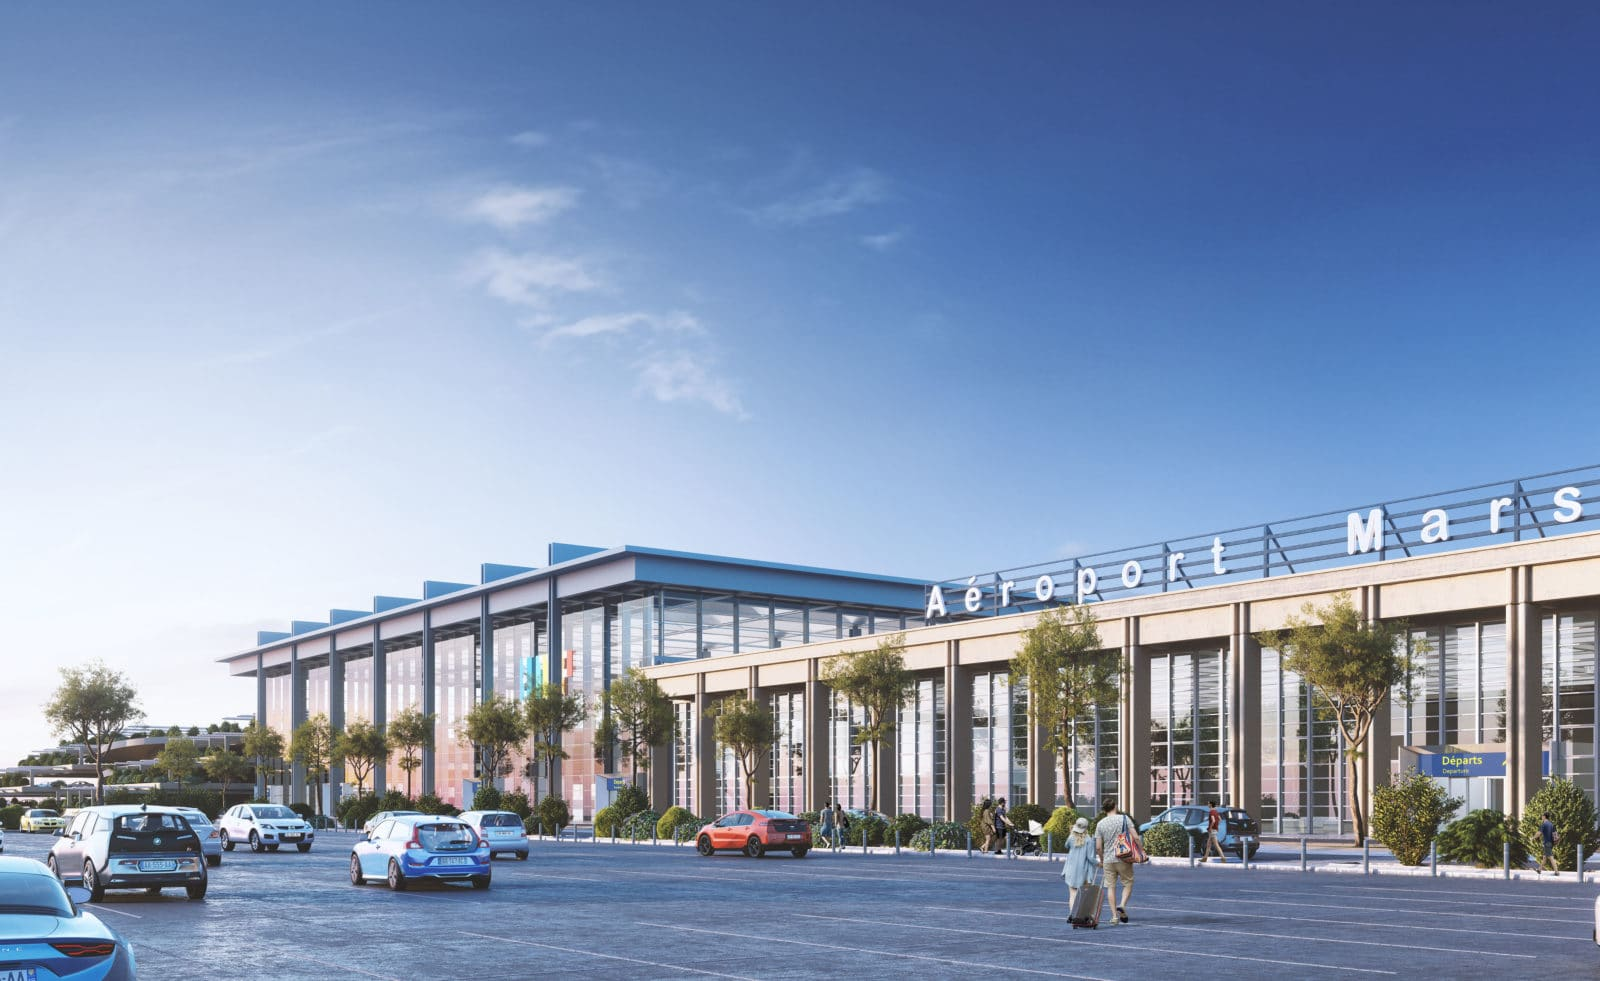 aeroport marseille extension foster 12